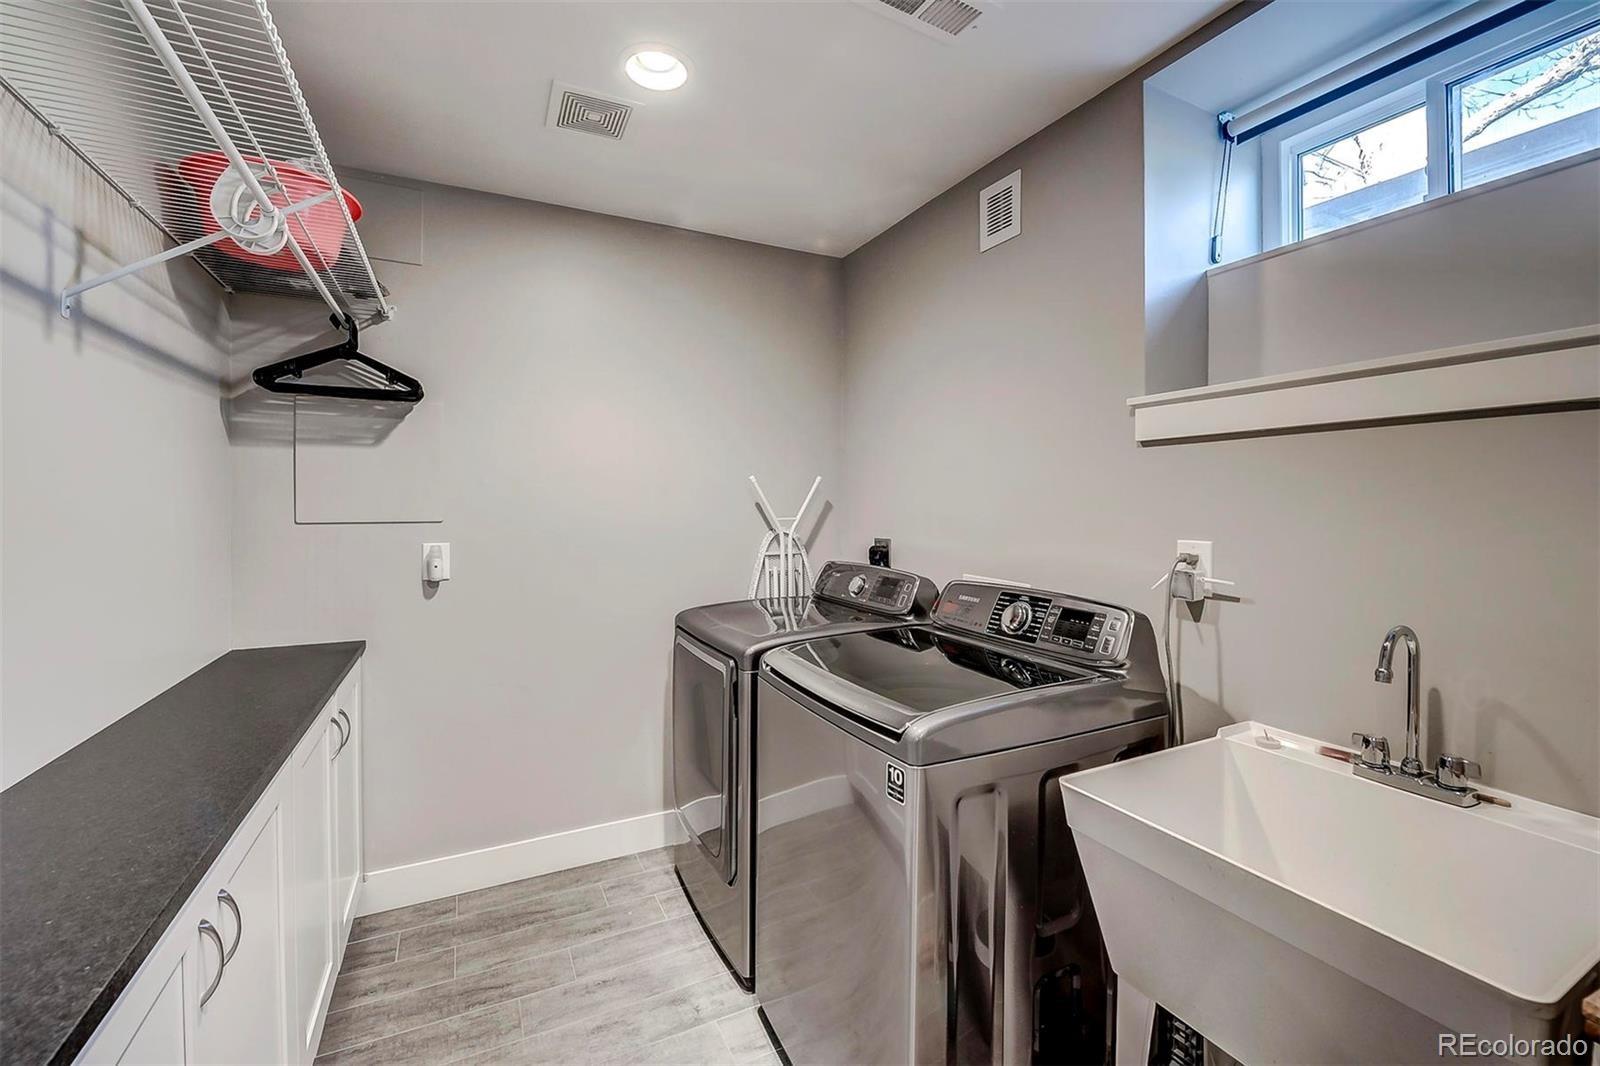 MLS# 5998764 - 1 - 3425  W 30th Avenue, Denver, CO 80211